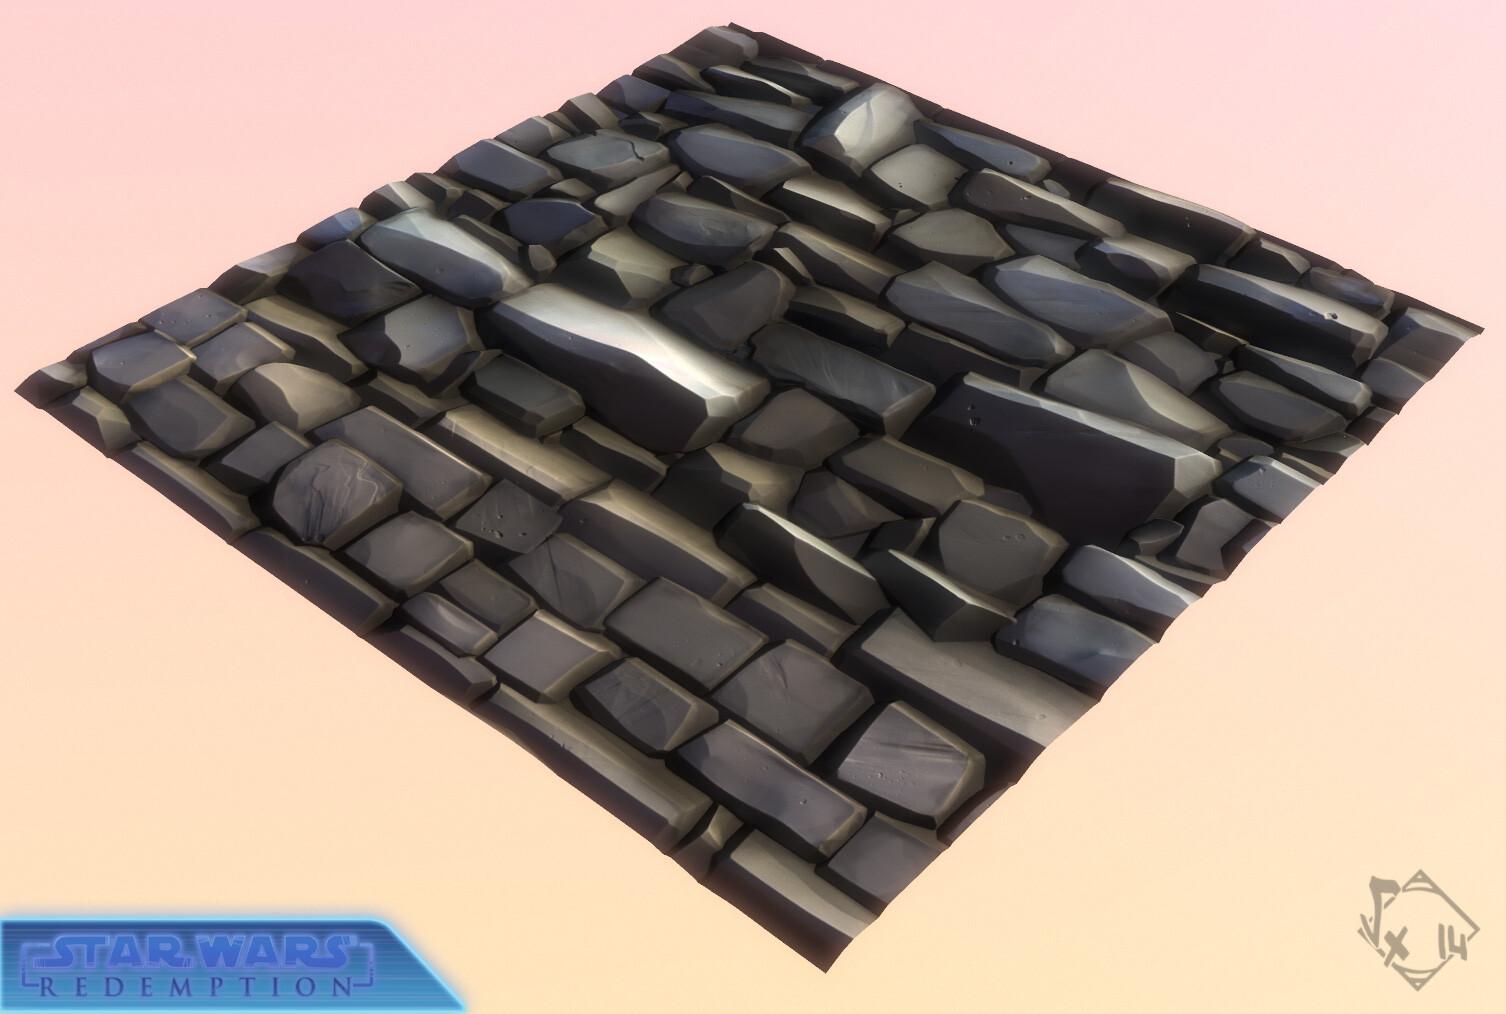 Wall bricks tile